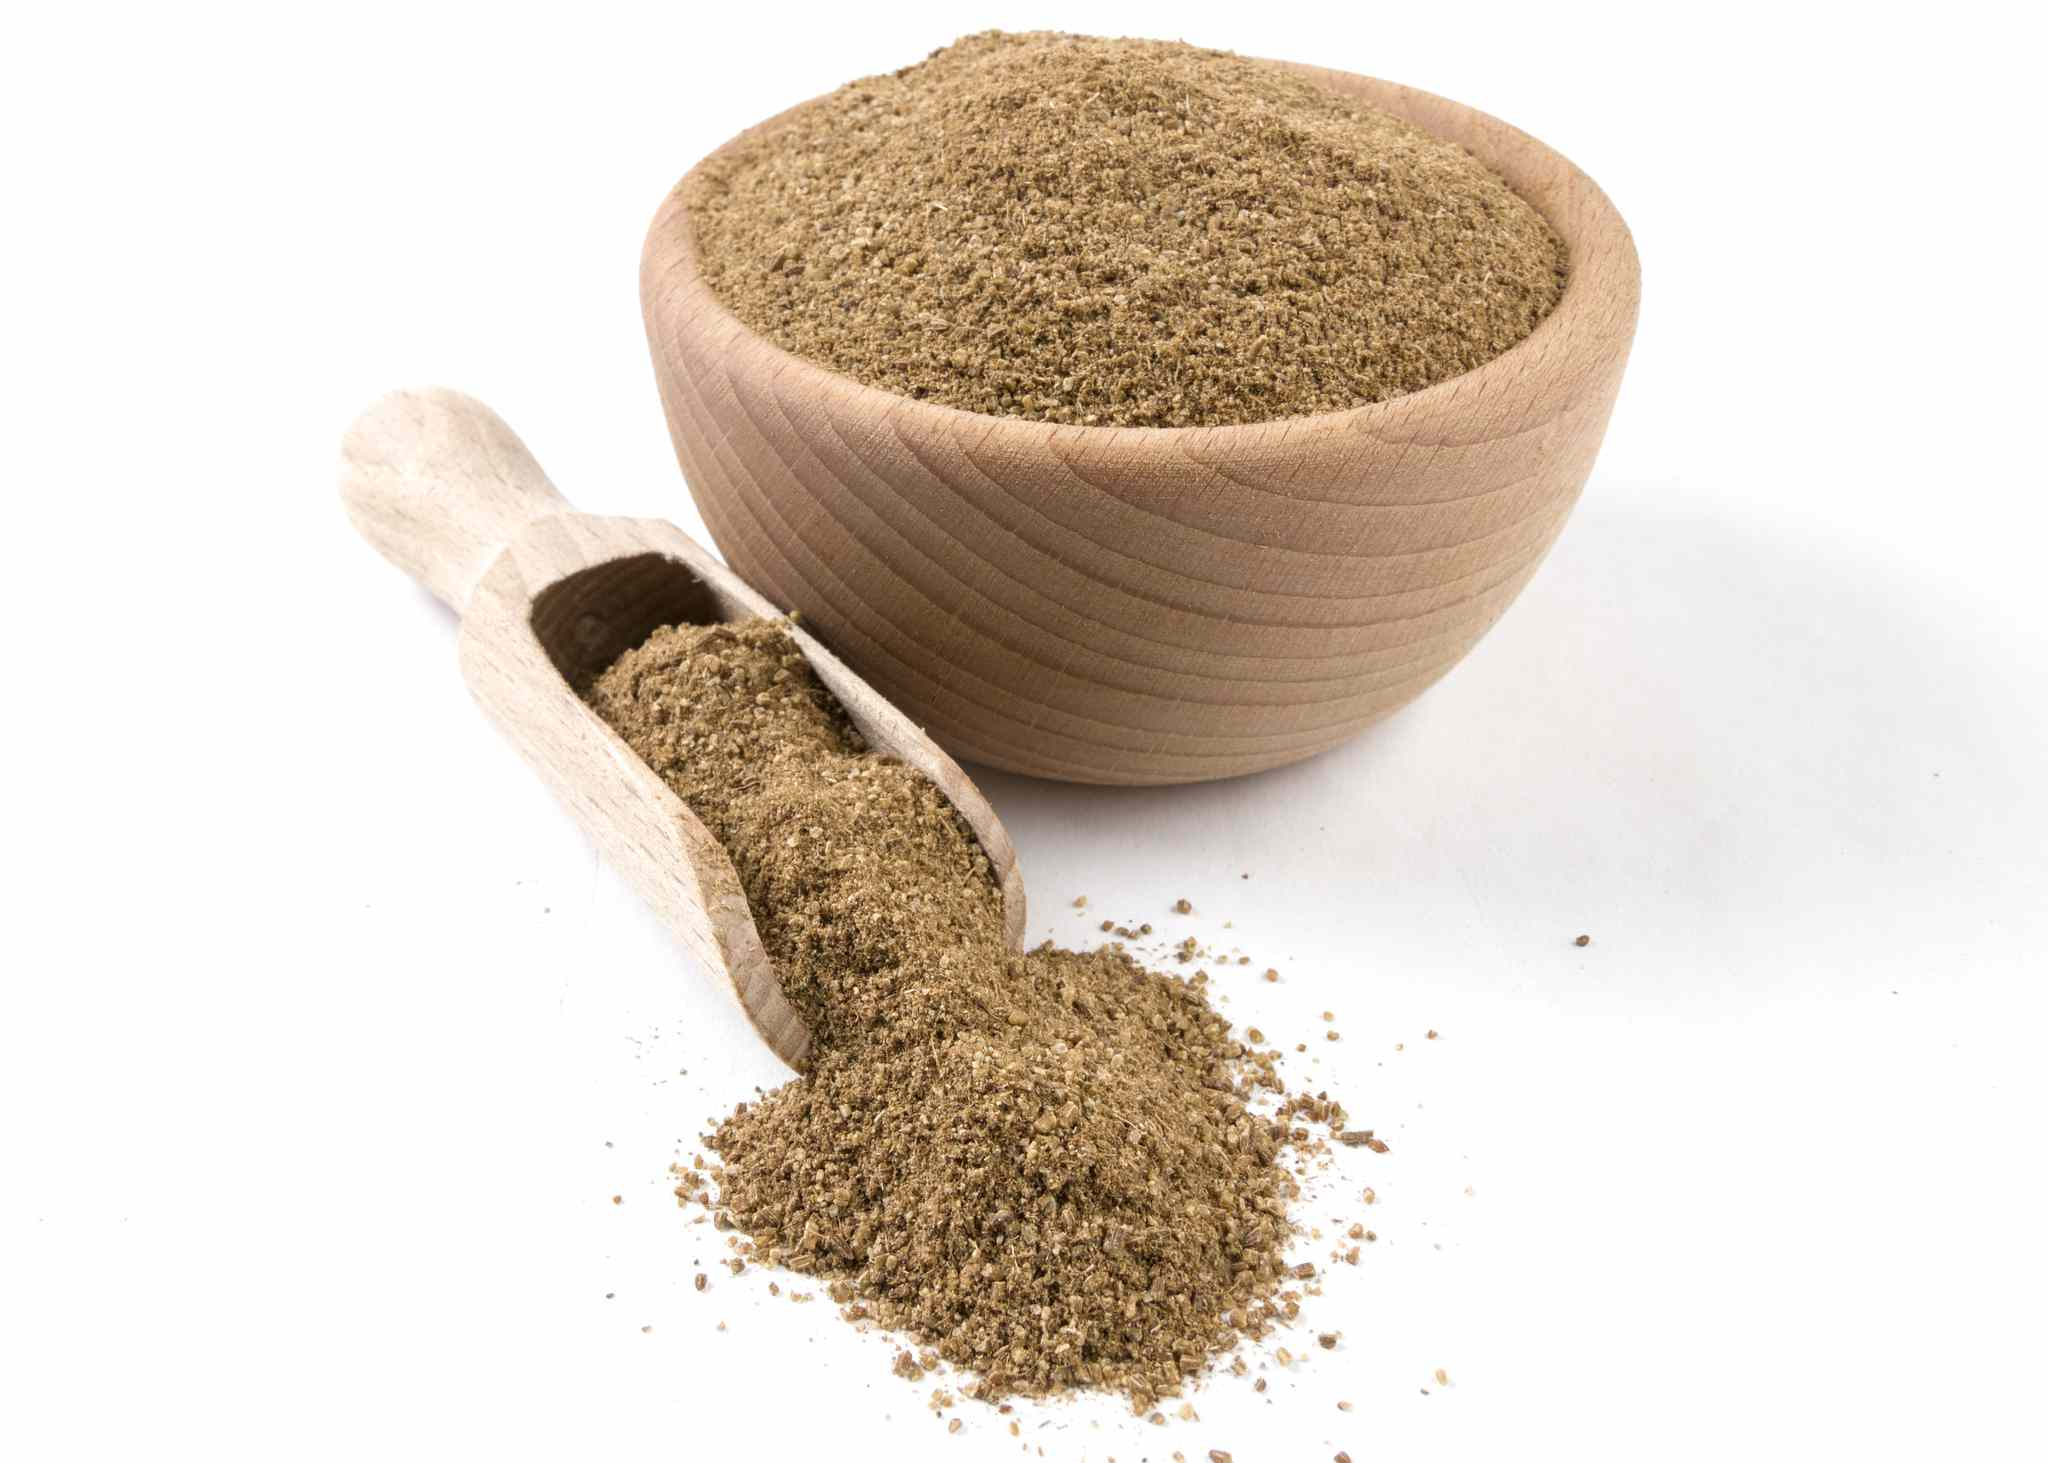 Ground caraway powder